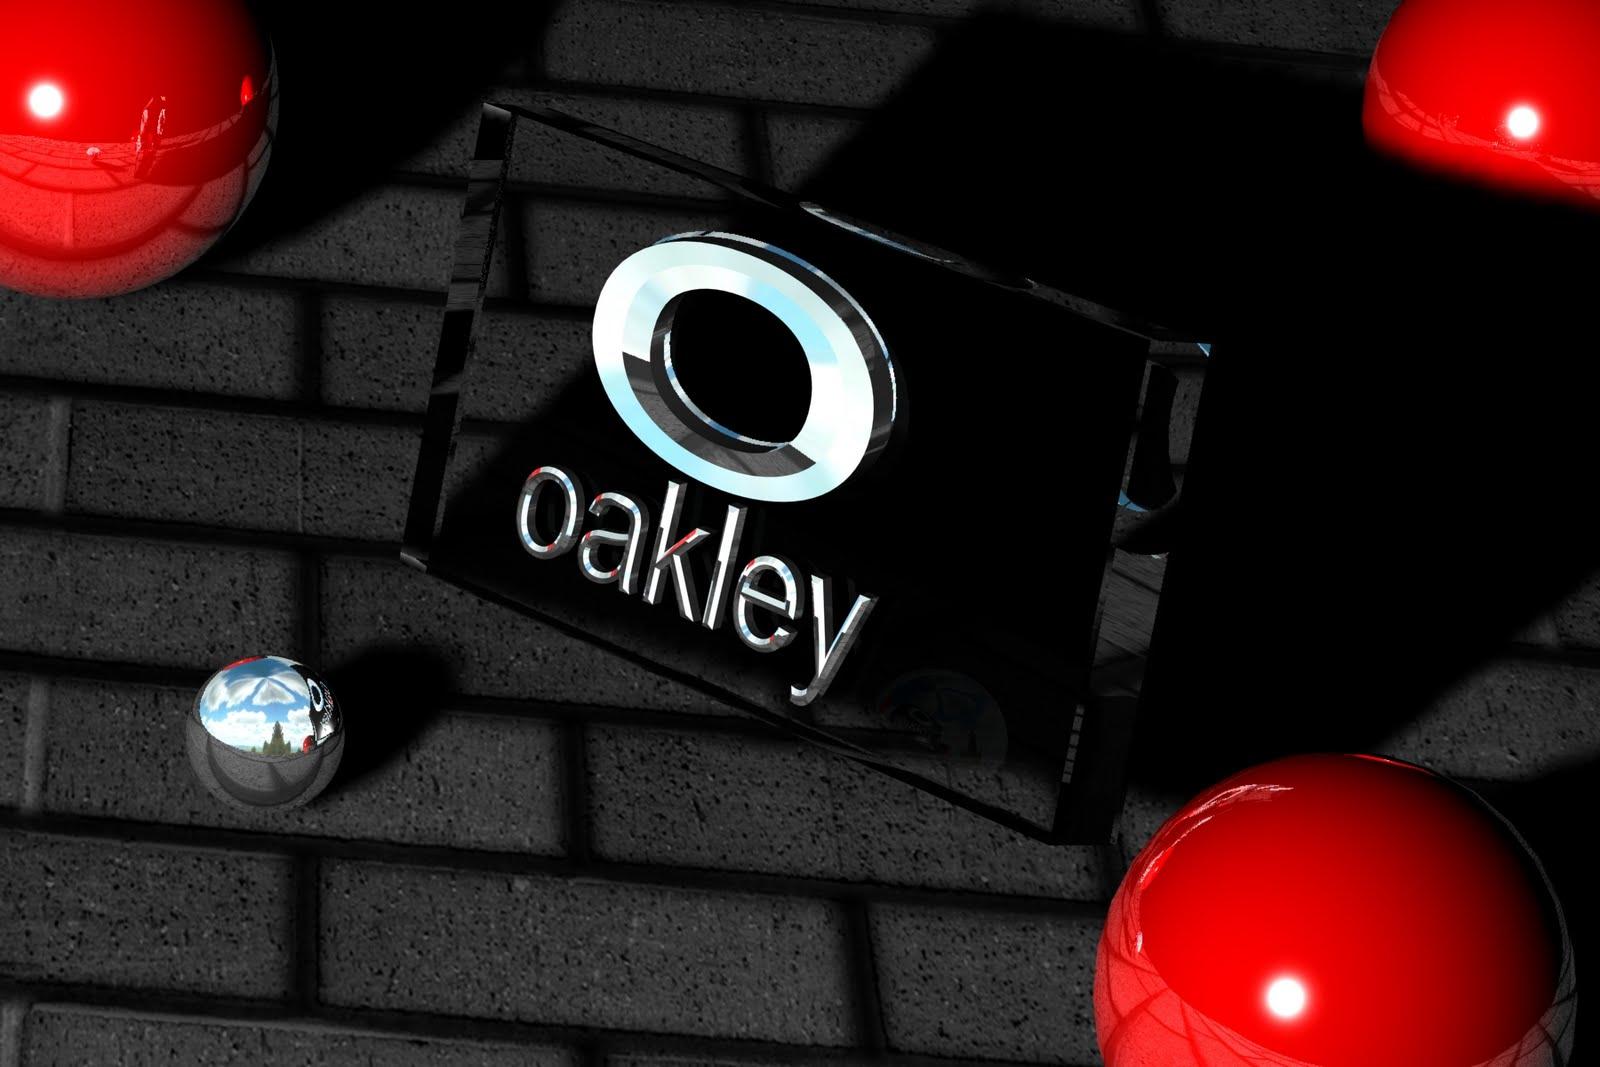 http://3.bp.blogspot.com/_avzzKMKqYNo/TFyVk9btJ1I/AAAAAAAAAEs/y4LqRmb0k8M/s1600/oakley.jpg